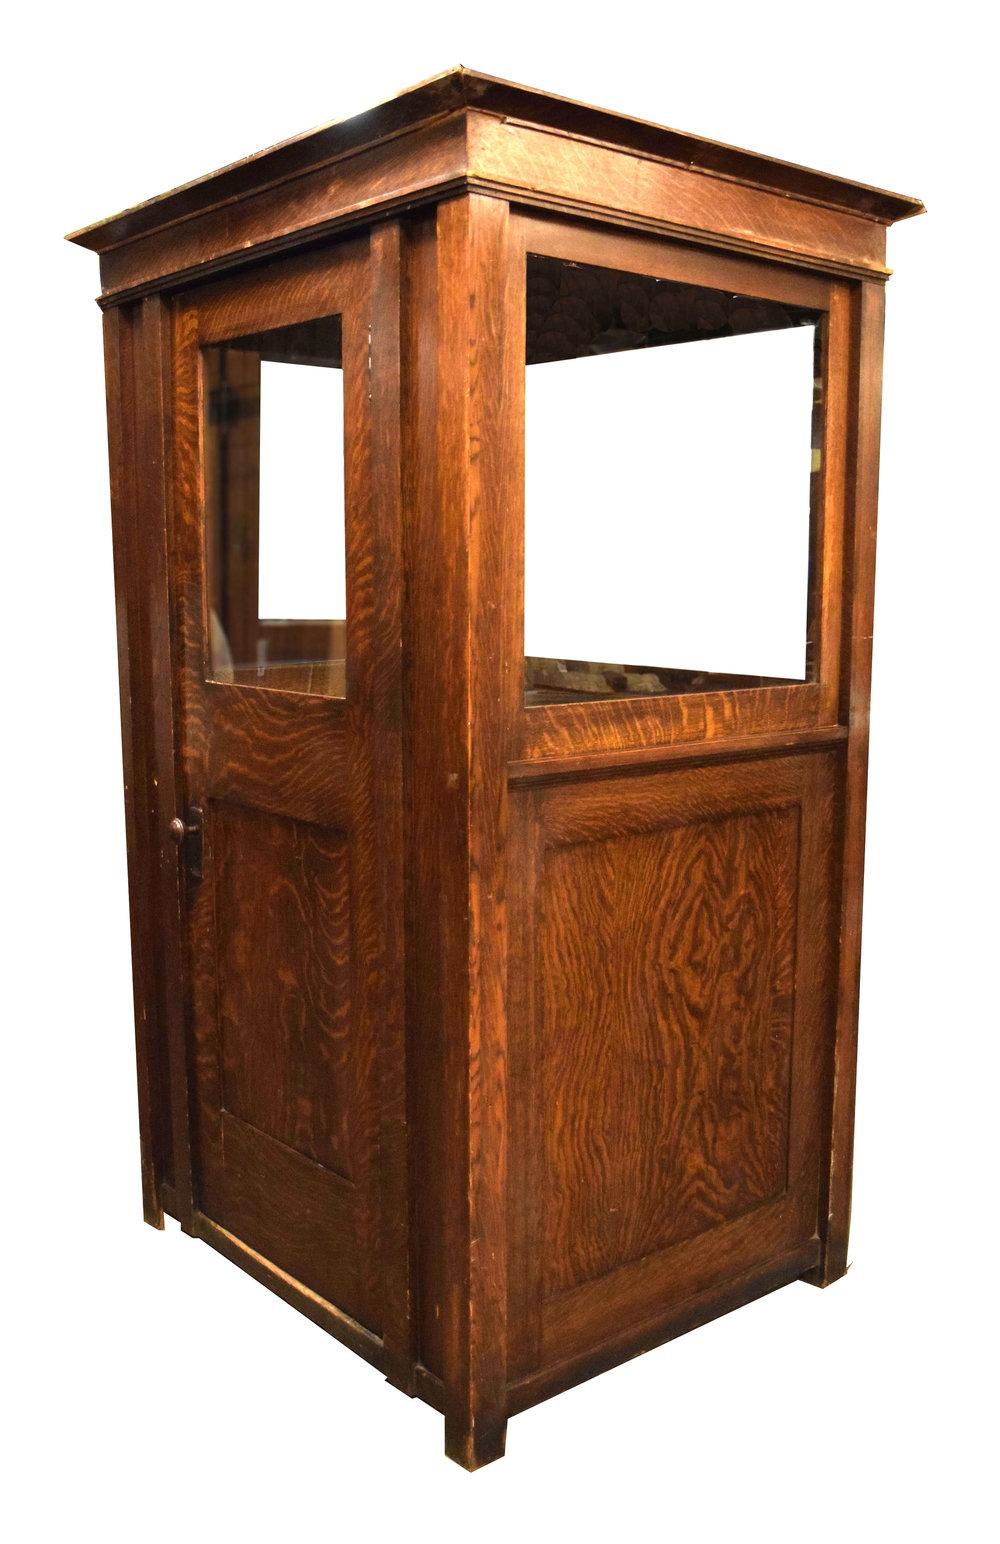 48050-oak-ticket-booth-main-new.jpg